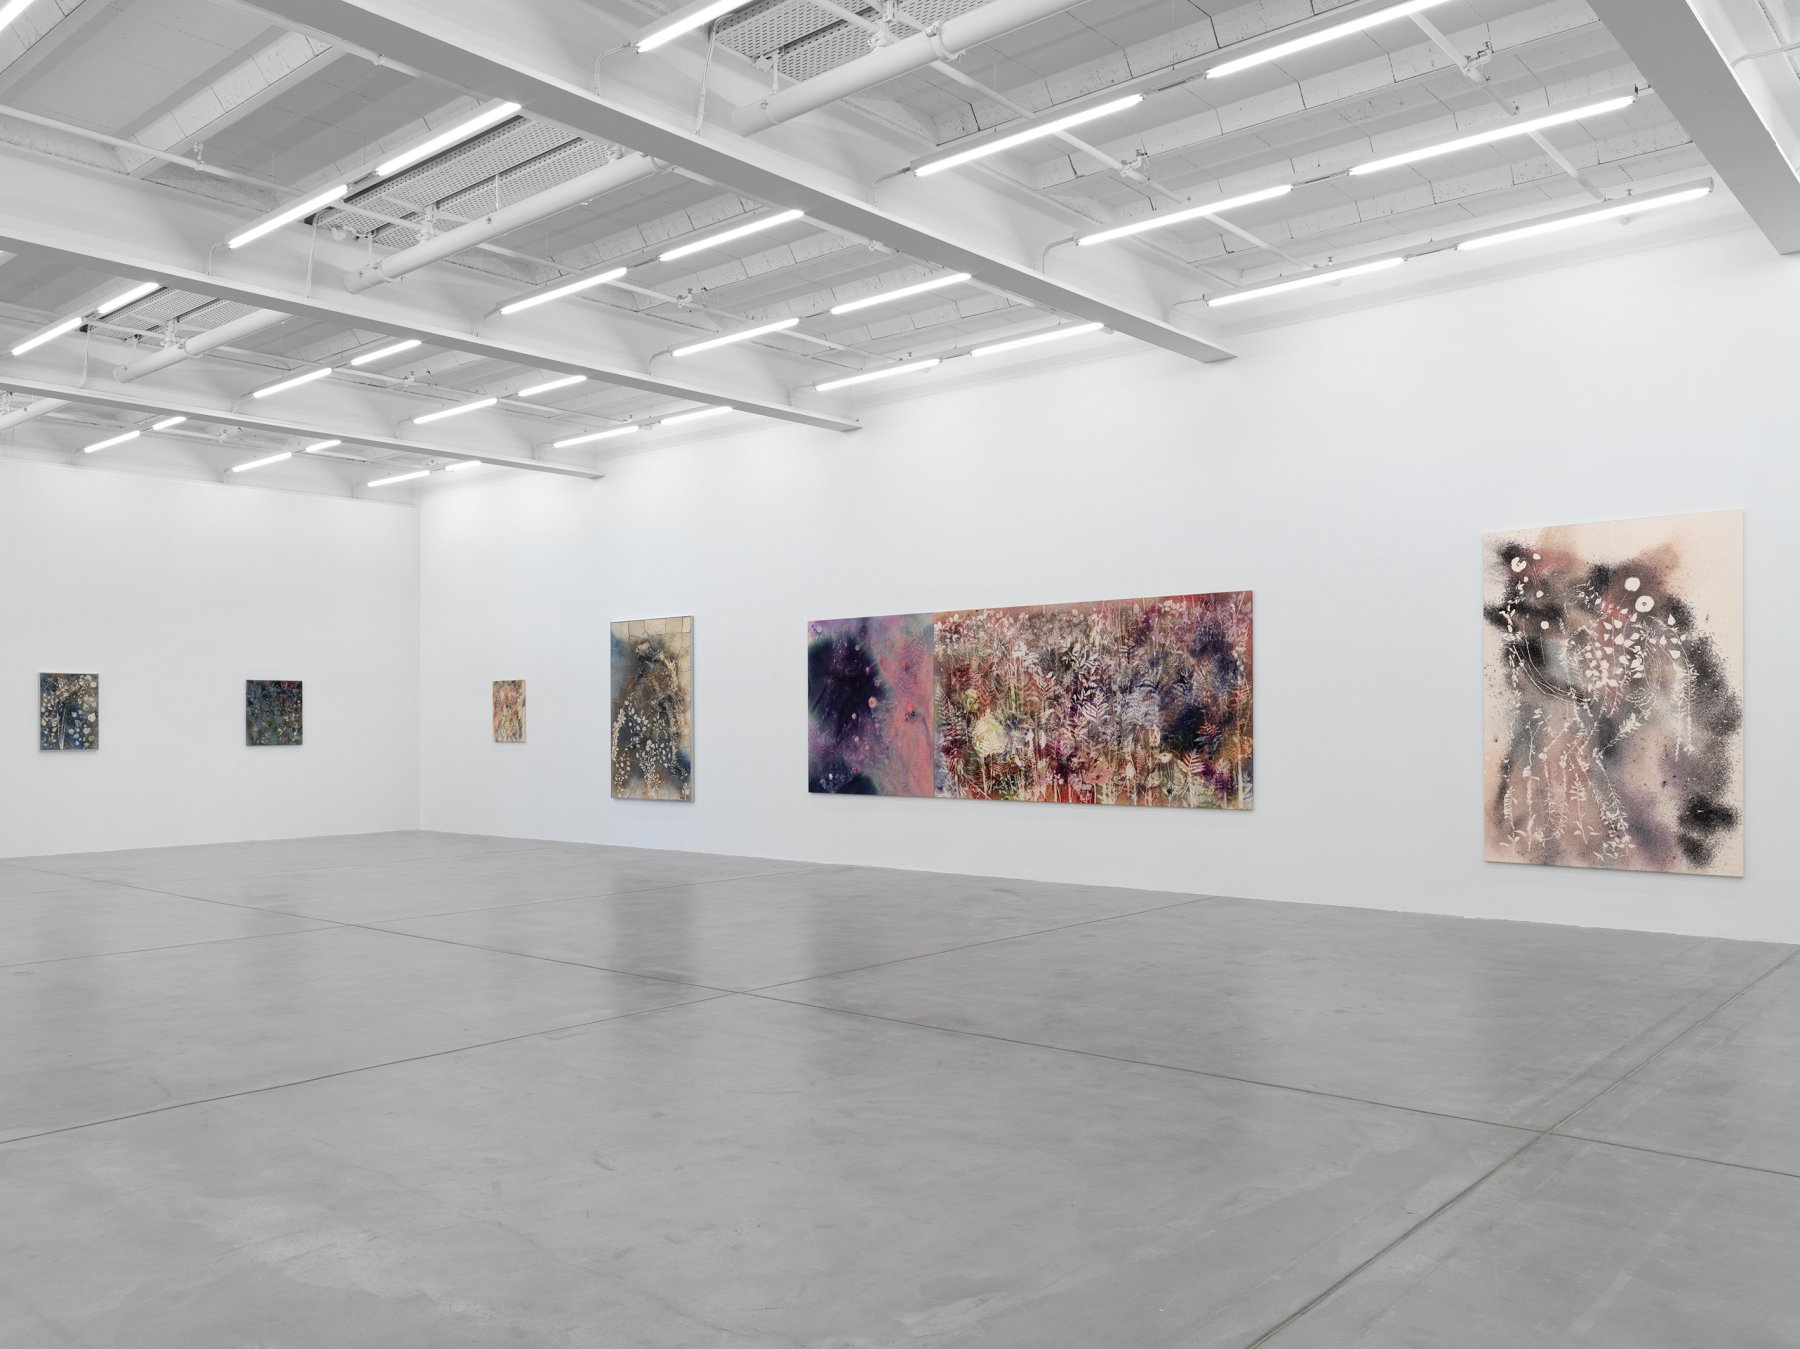 Galerie Eva Presenhuber Maag Areal Sam Falls 1